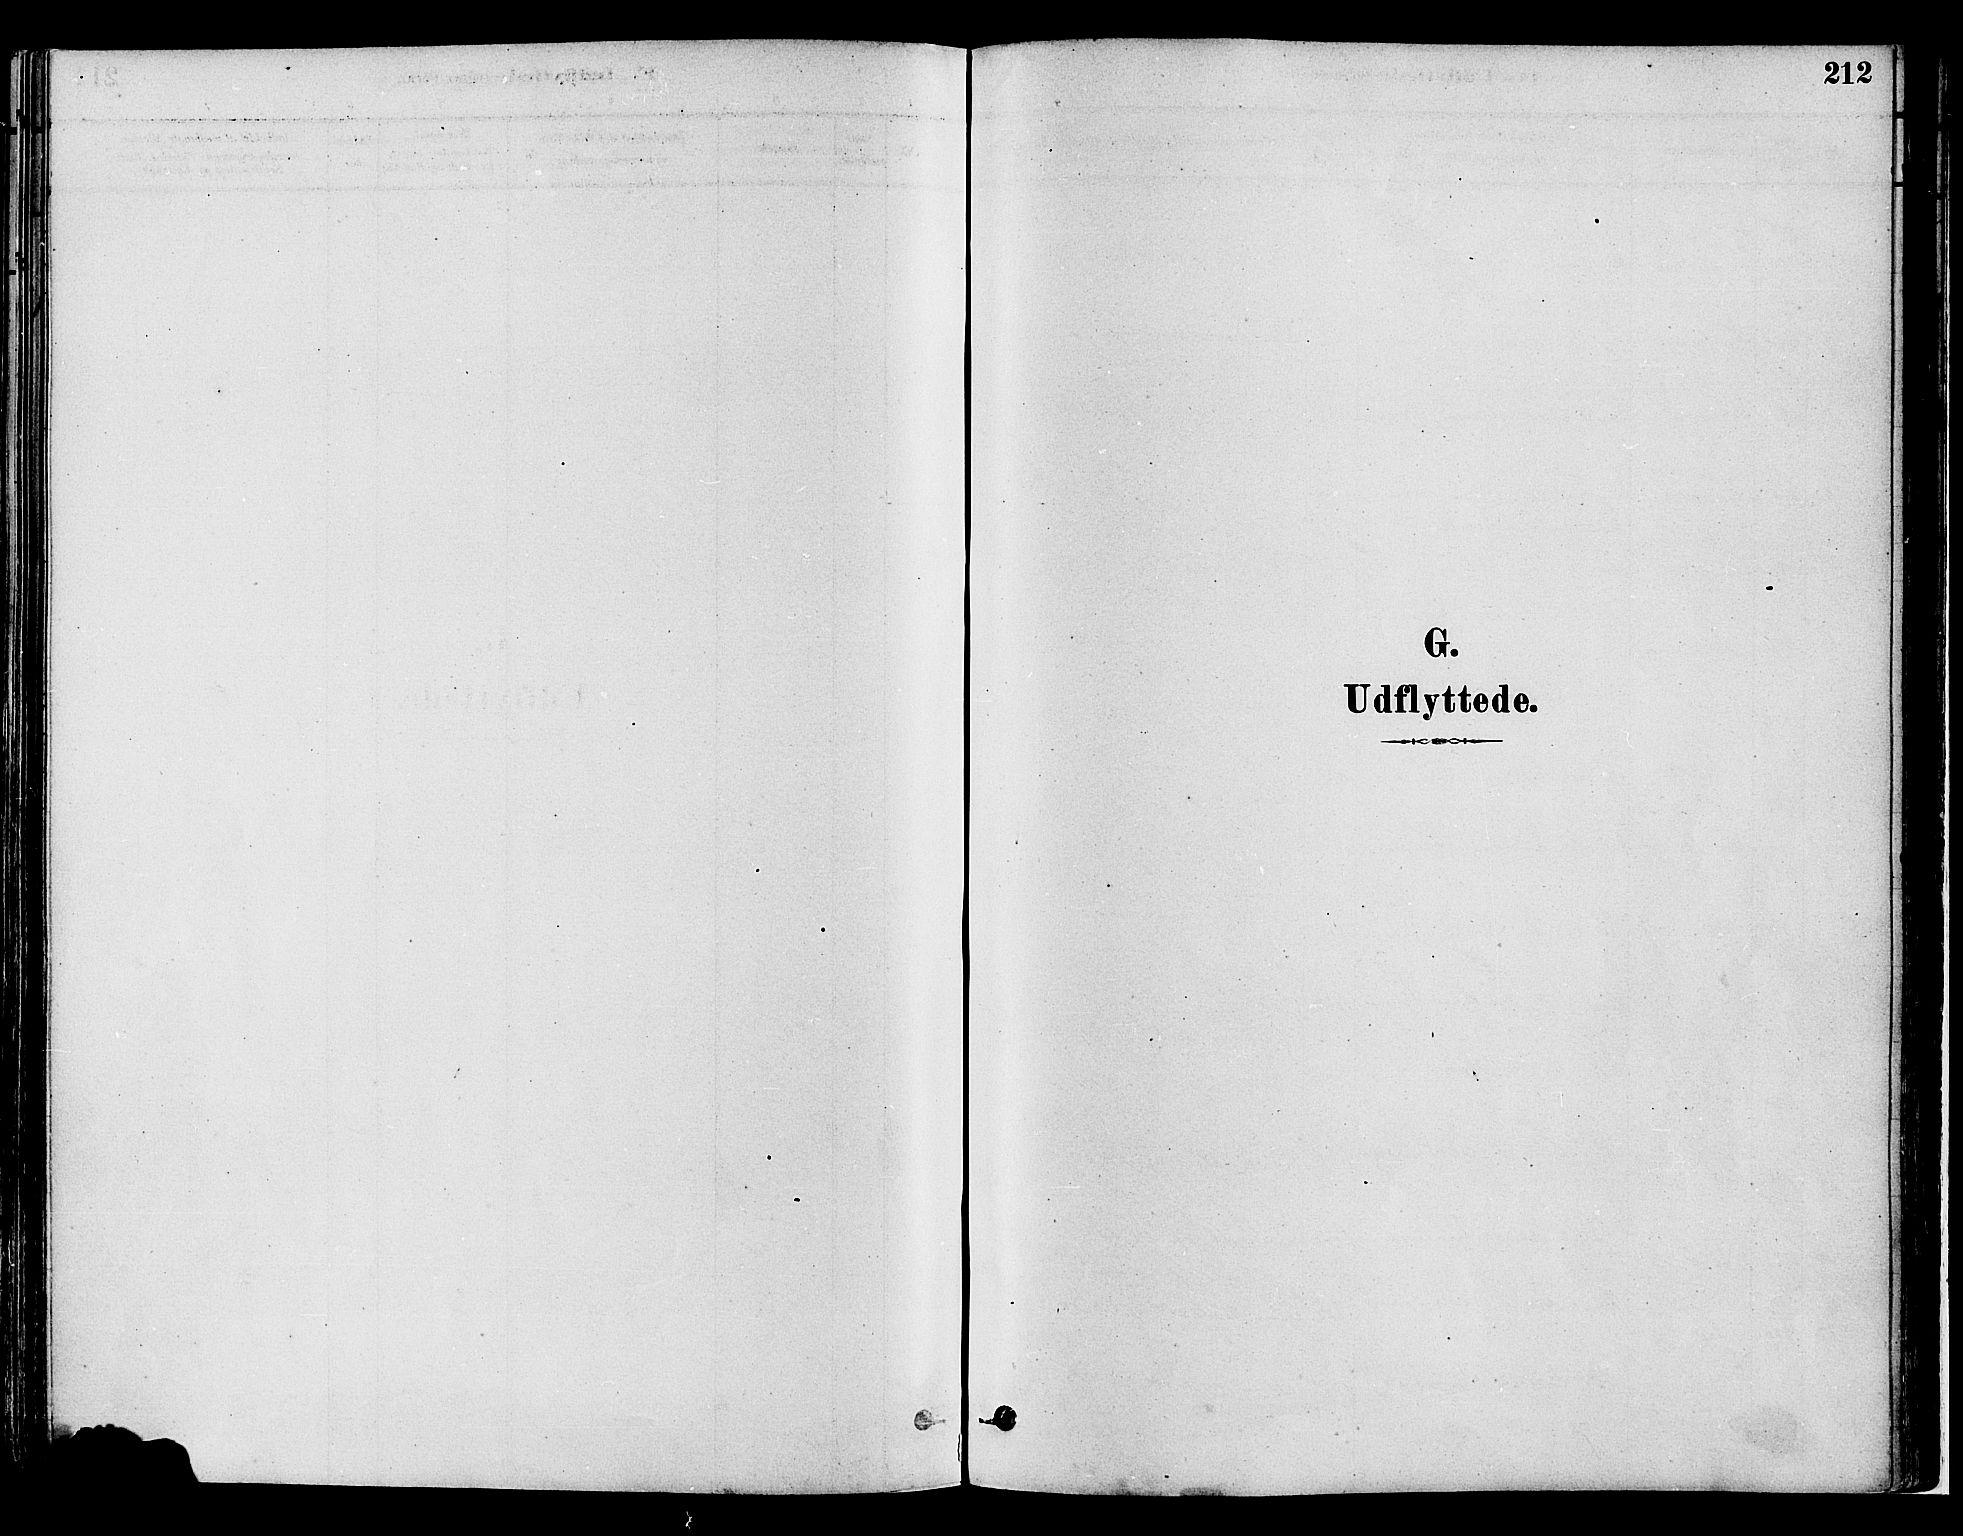 SAH, Gran prestekontor, Ministerialbok nr. 14, 1880-1889, s. 212